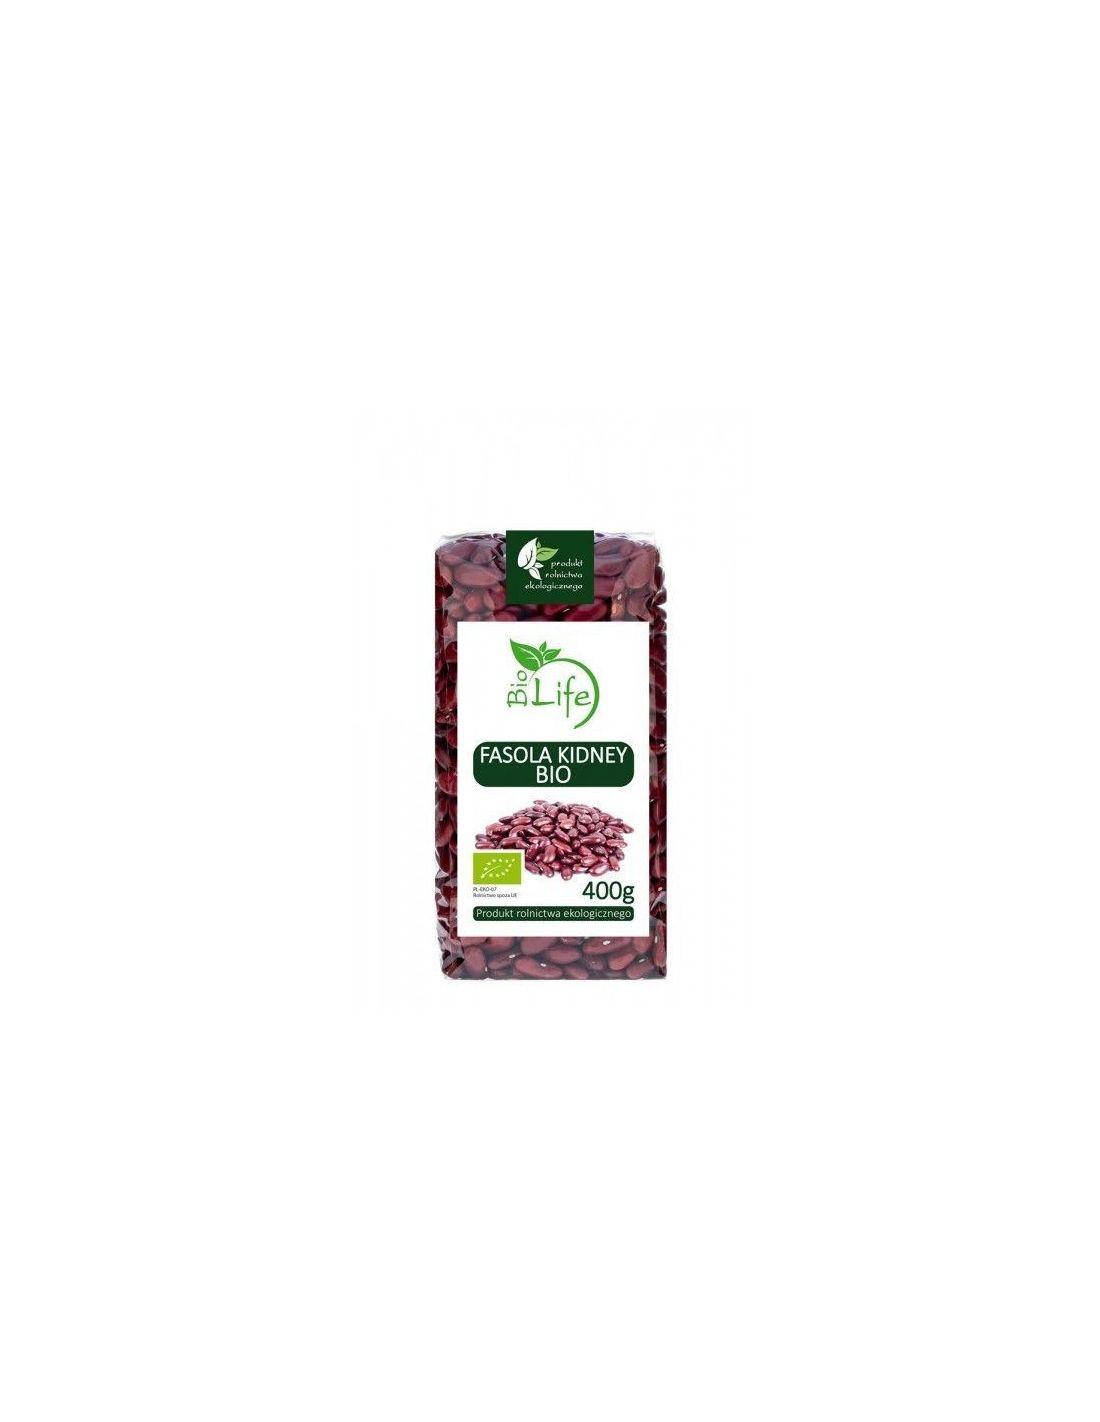 Mahe kidney oad 400g